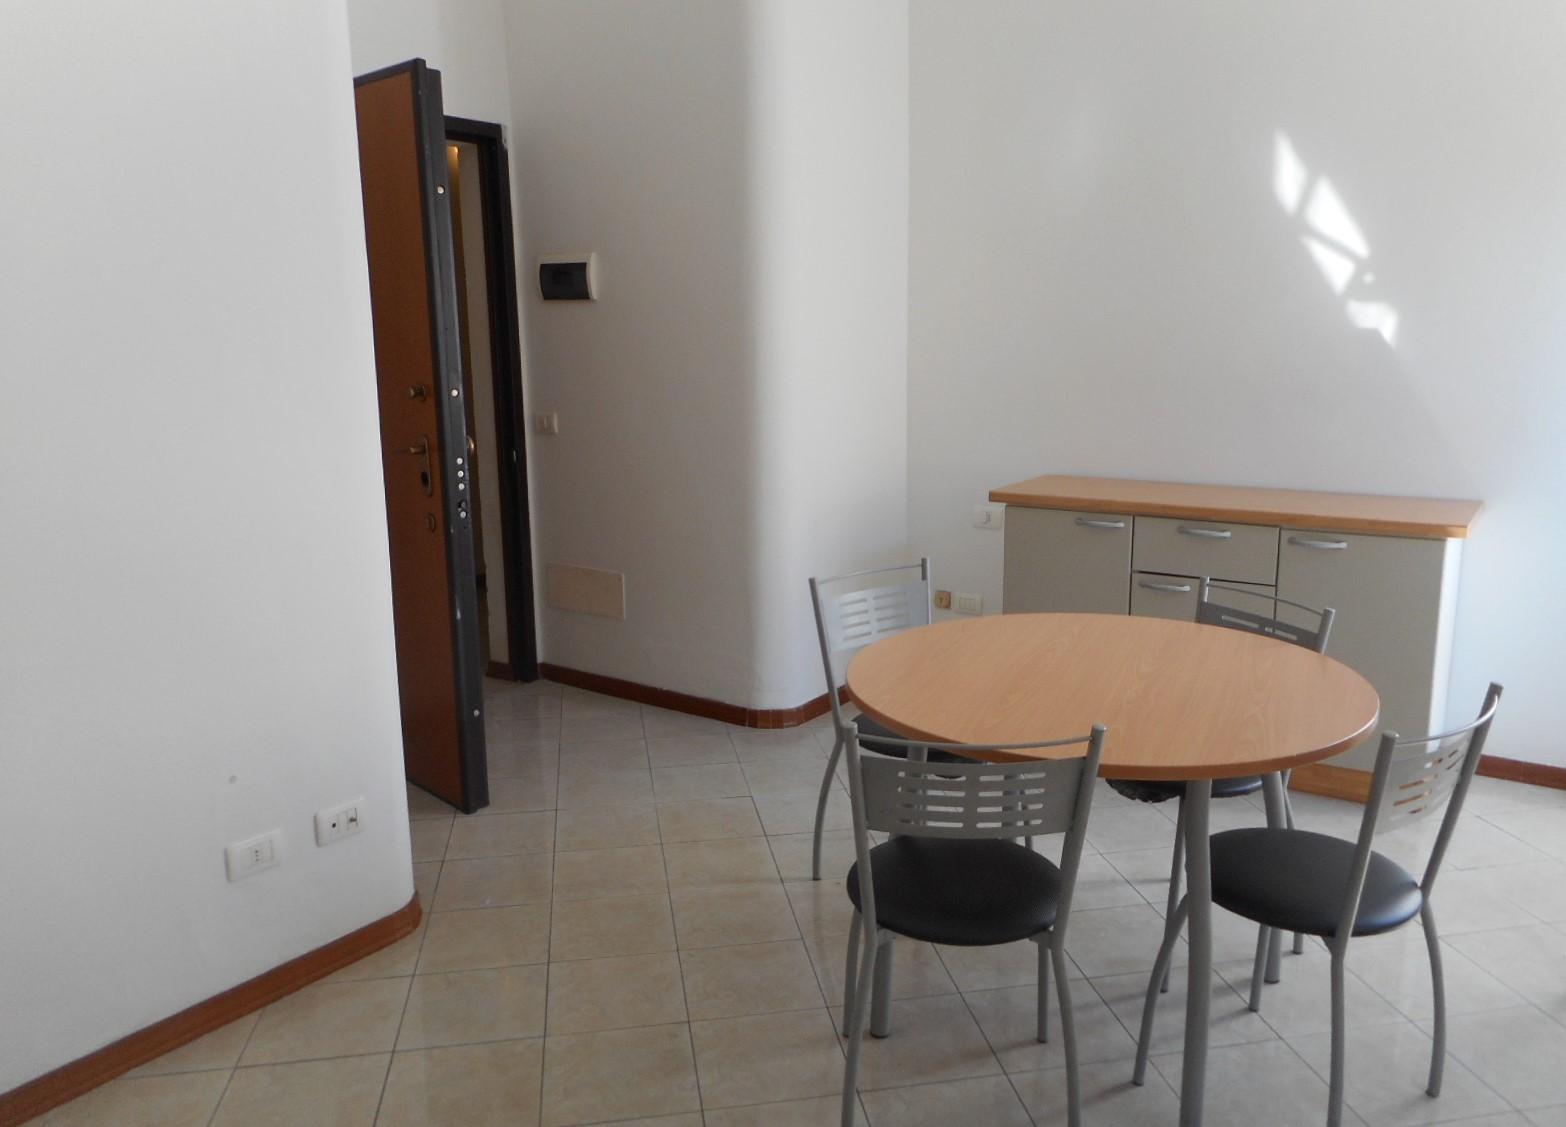 zona centrale,pistoia,51100,2 Bedrooms Bedrooms,1 BagnoBathrooms,Appartamento,zona centrale,1,1092